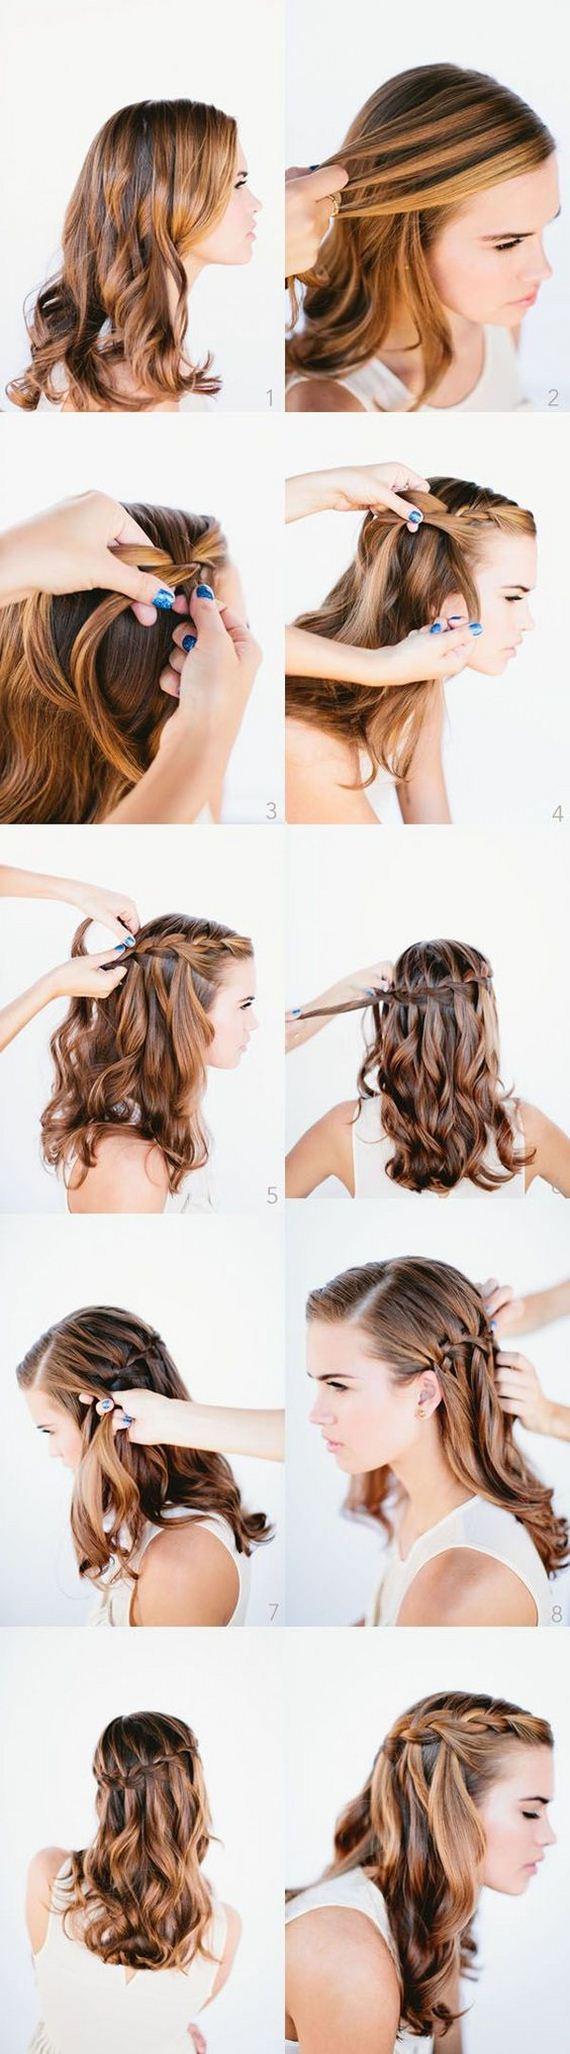 11-style-bangs